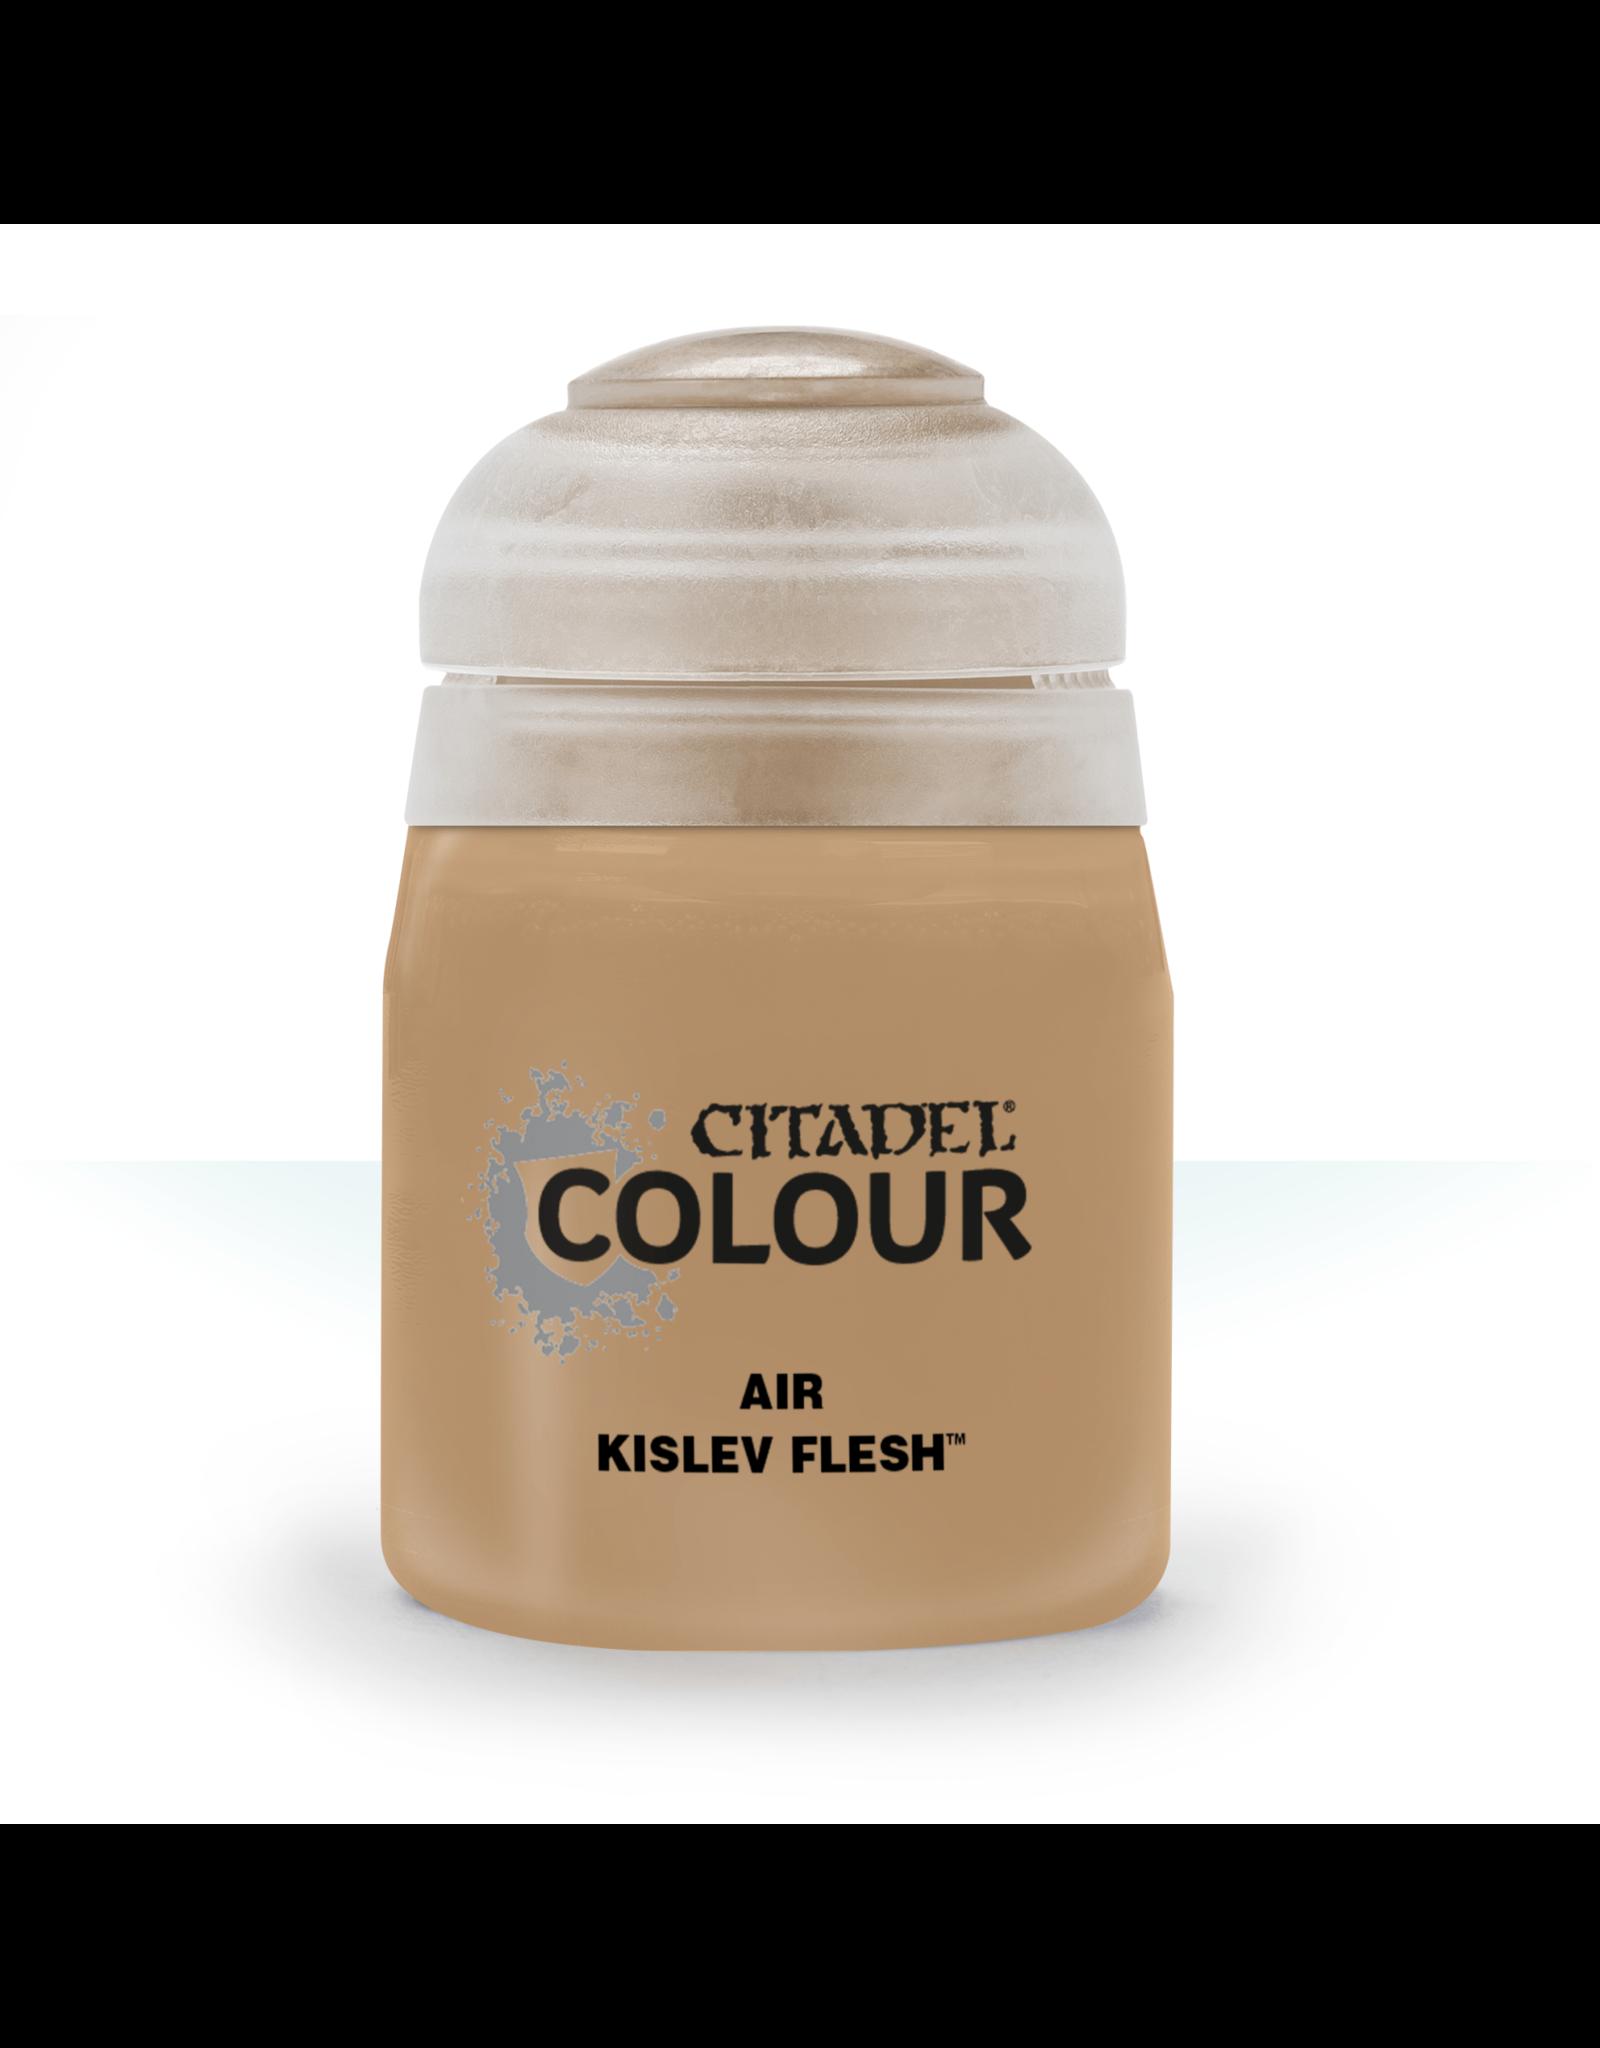 Citadel Citadel Paints Air Paint Kislev Flesh